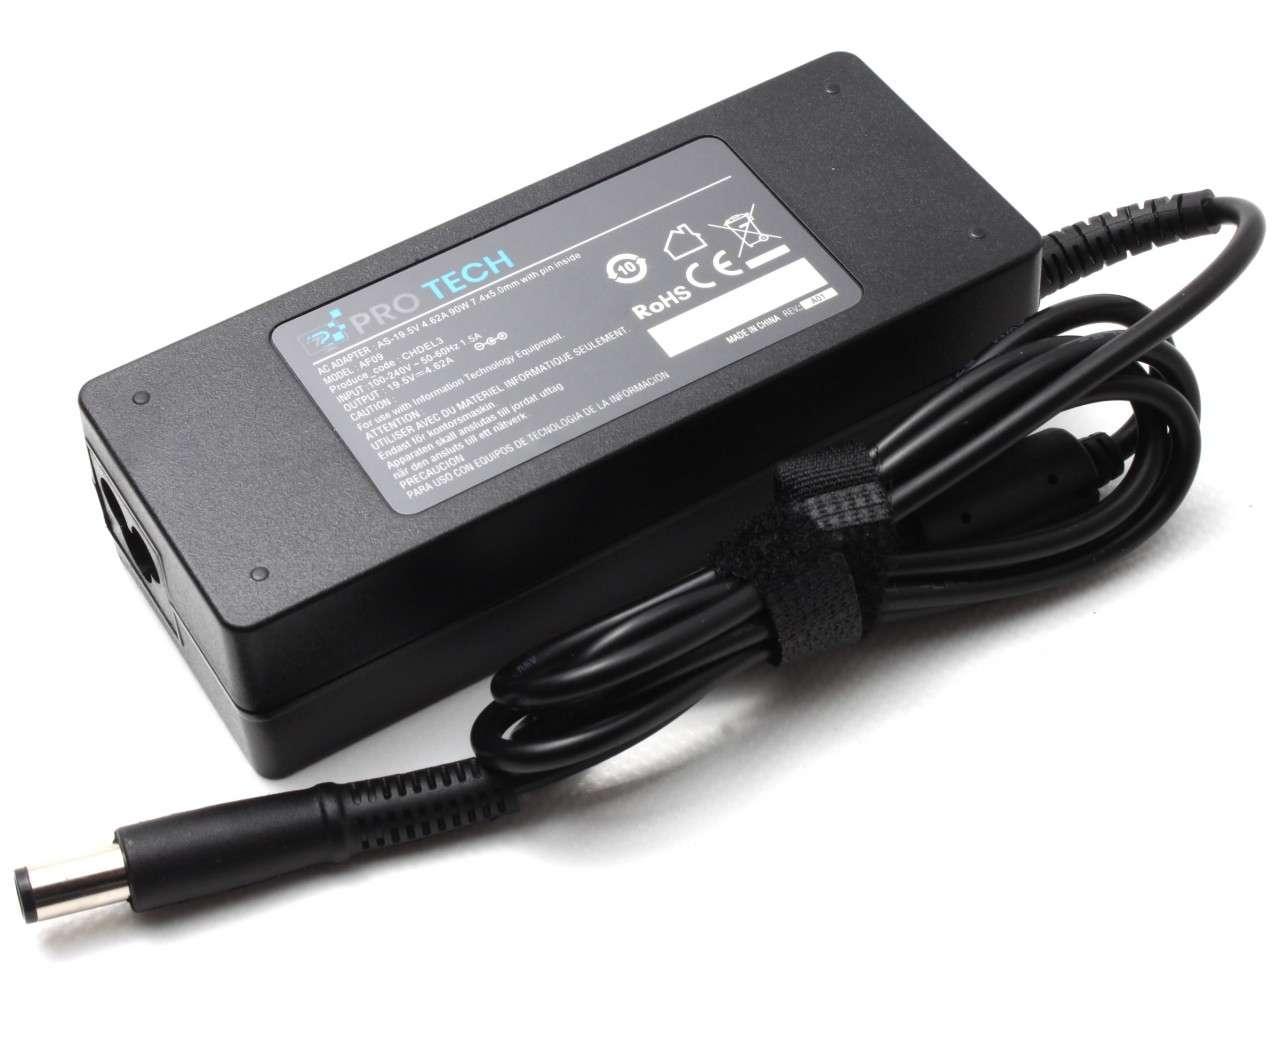 Incarcator Dell Studio XPS 1340 Replacement imagine powerlaptop.ro 2021